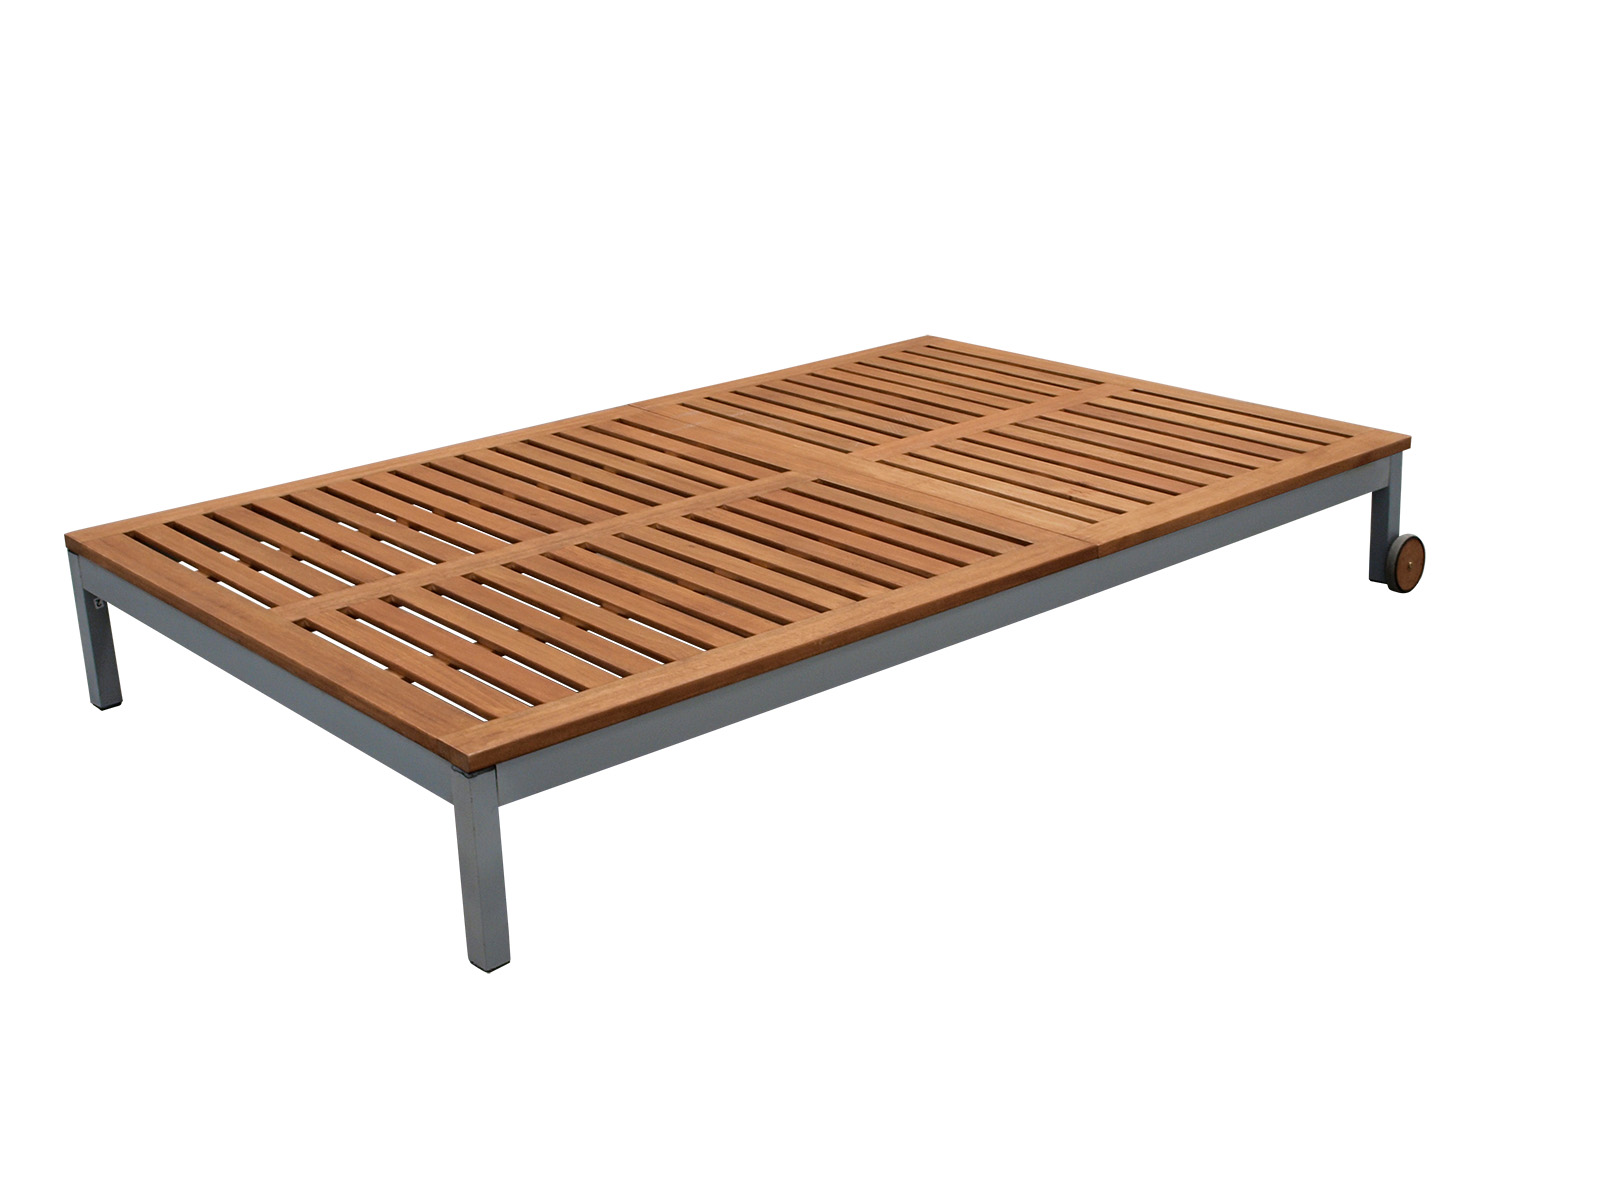 doppel sonnenliege rollenliege doppelliege santiago metall eukalyptus 2 wahl ebay. Black Bedroom Furniture Sets. Home Design Ideas